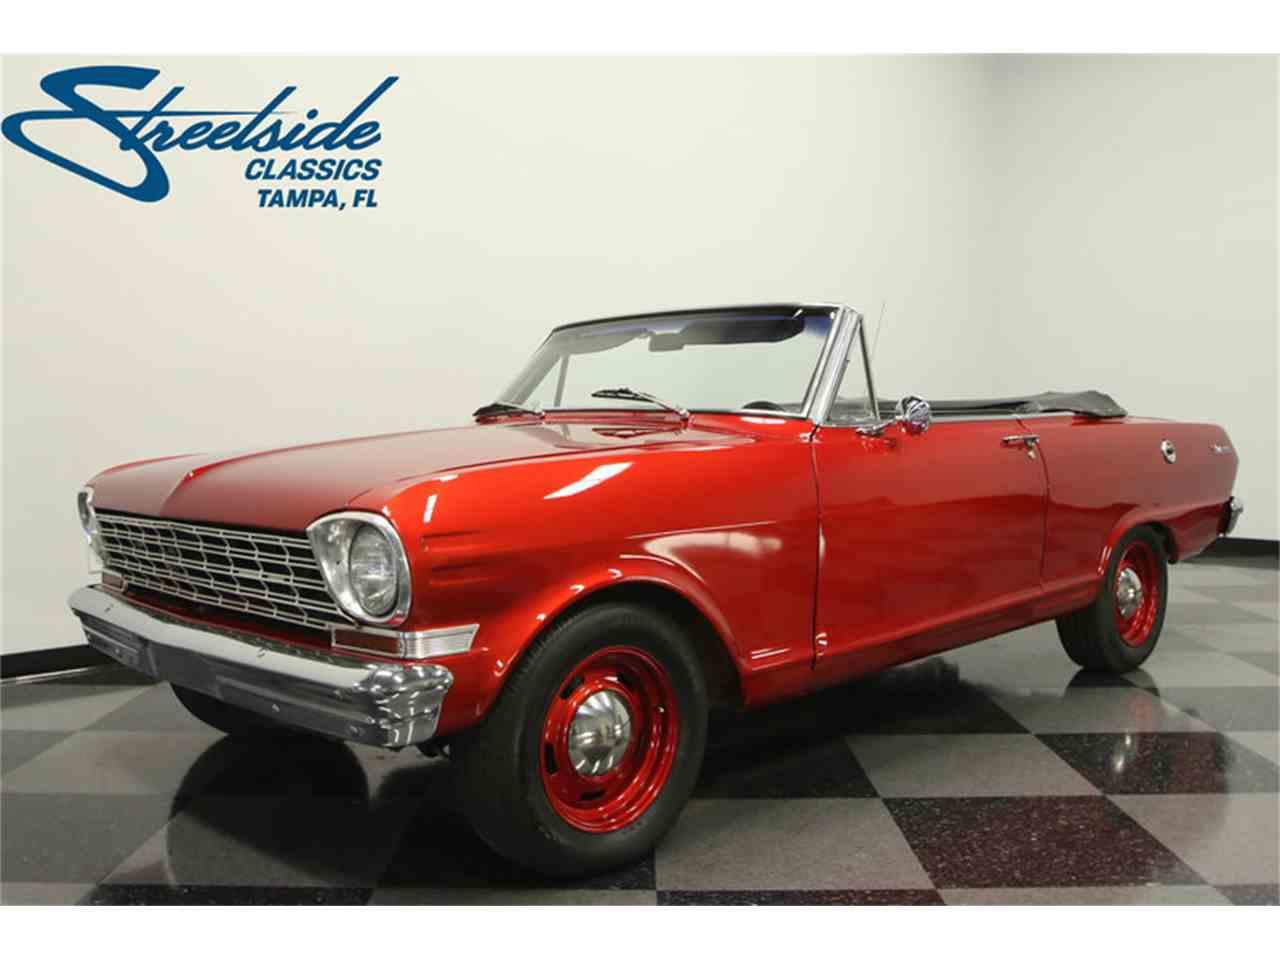 Classic Car Auctions Tampa Florida